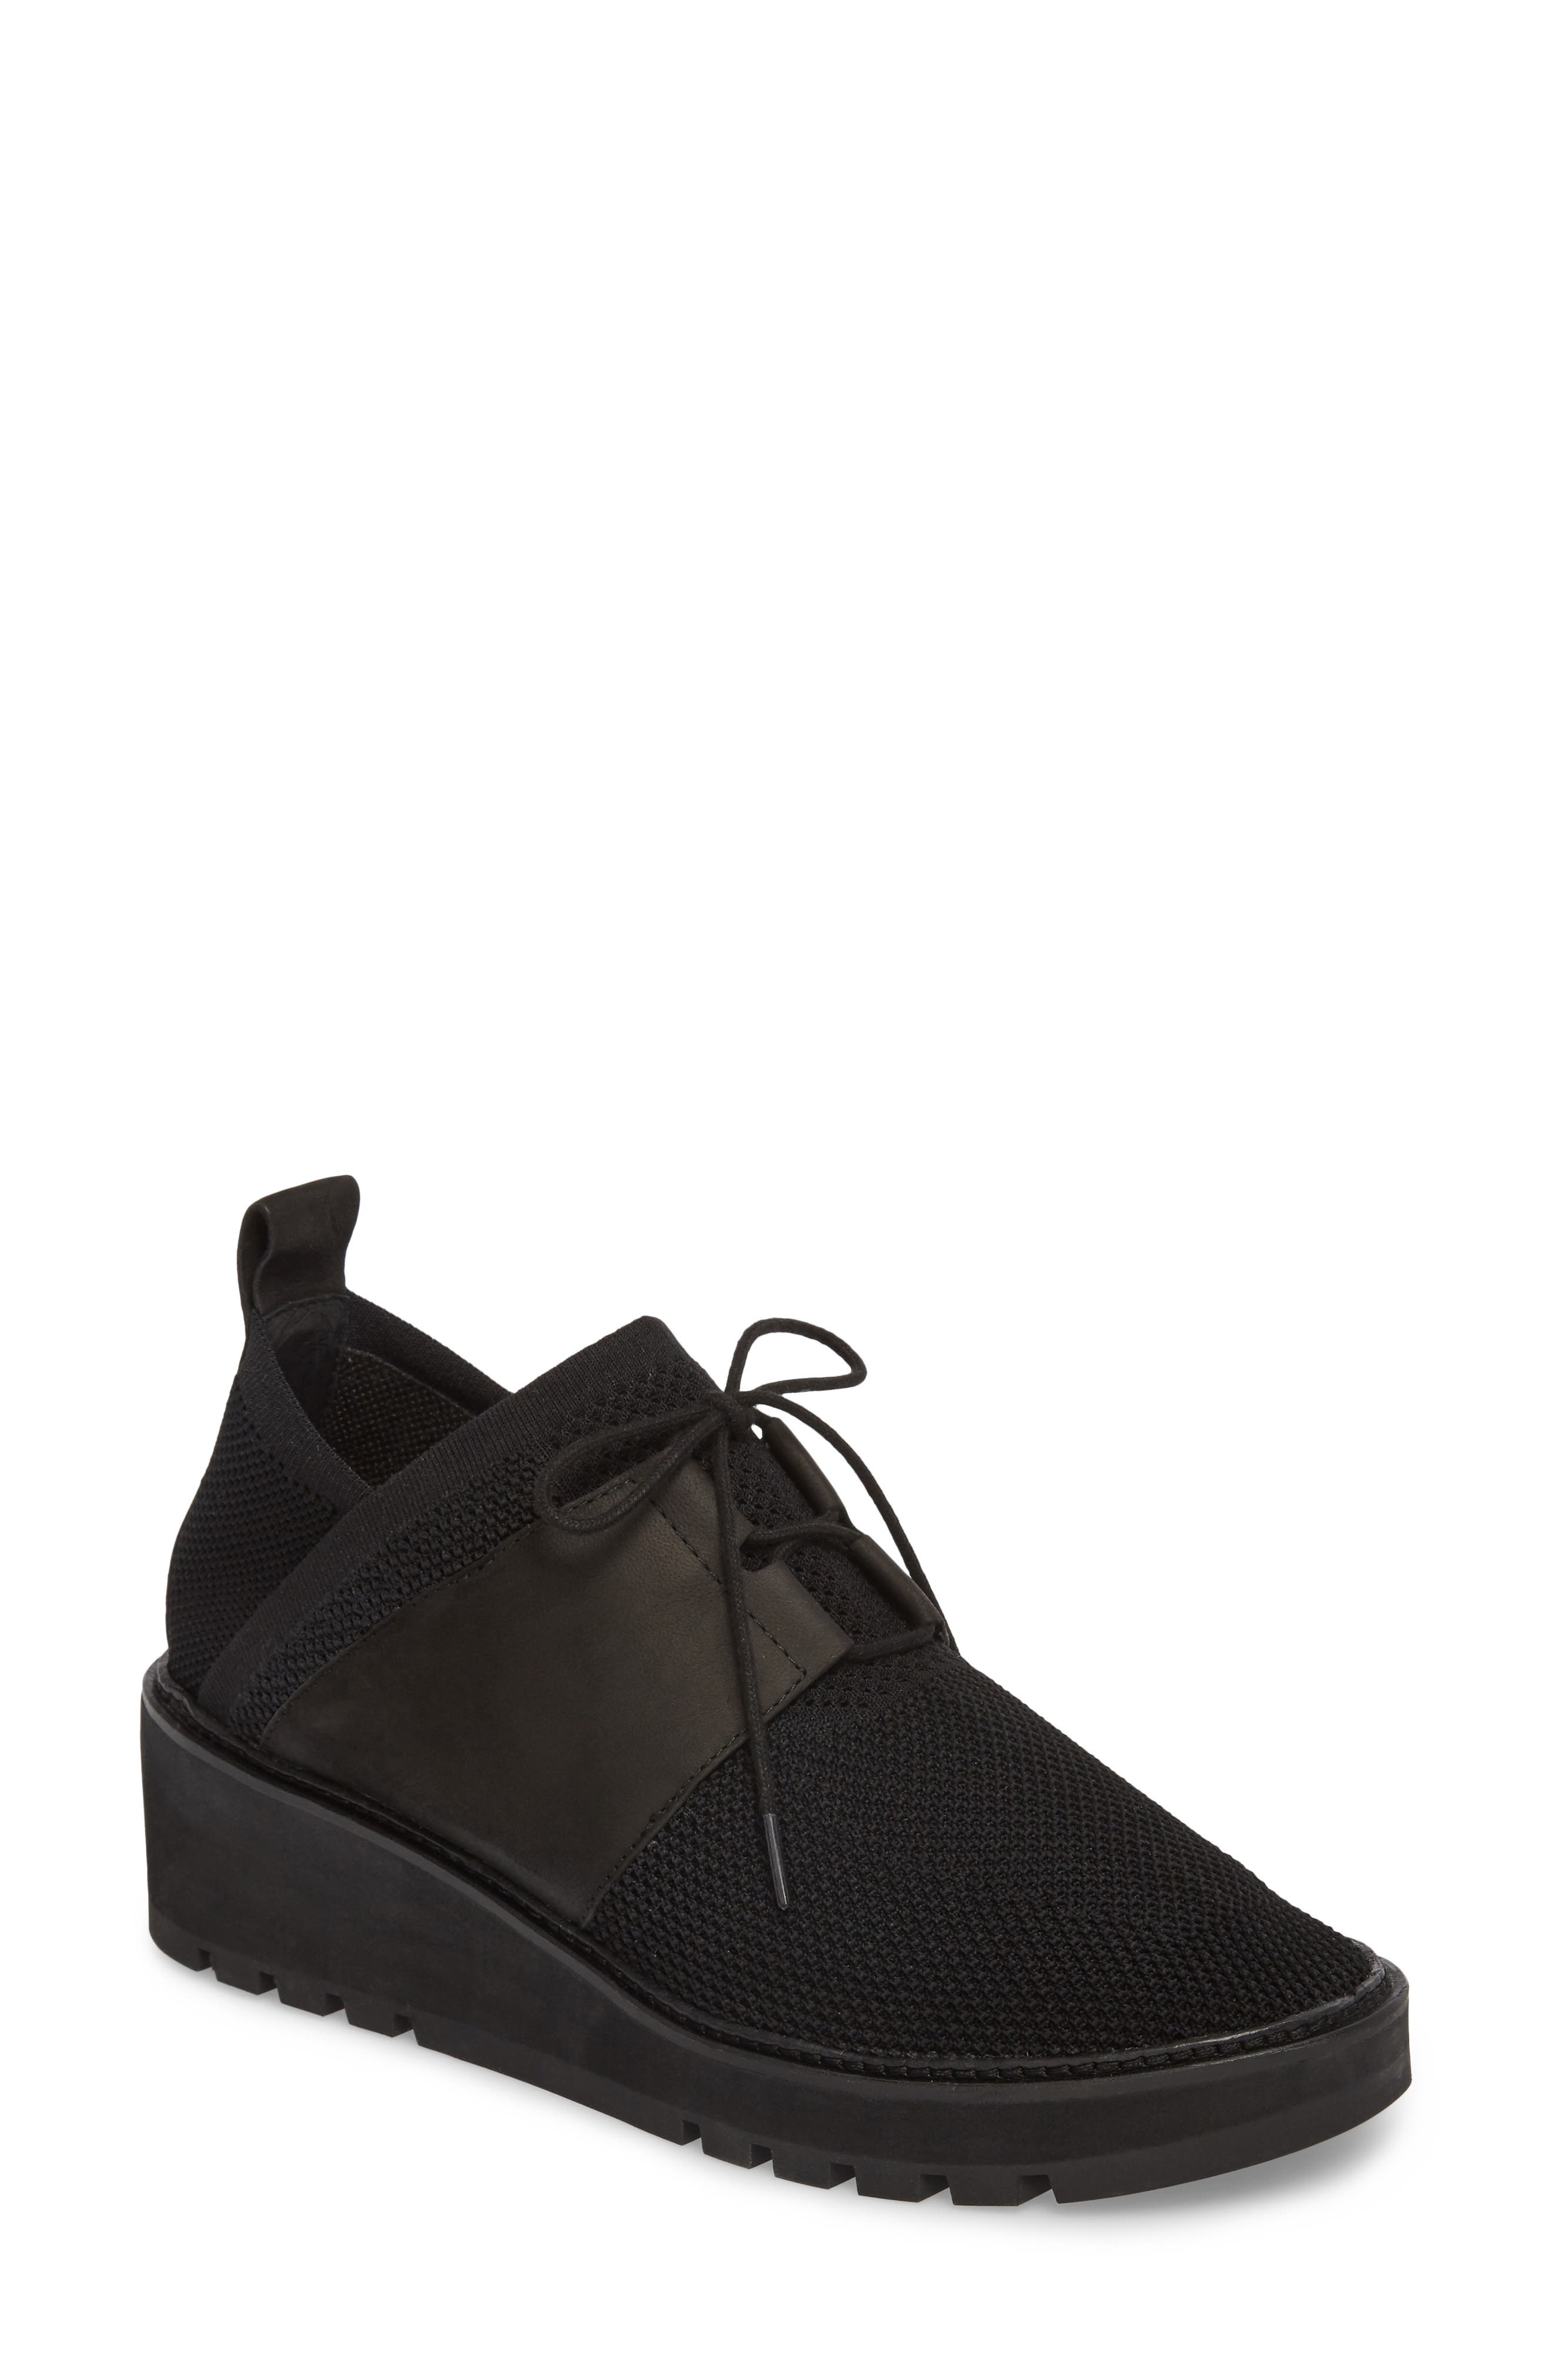 Wilson Sneaker,                         Main,                         color, Black Fabric